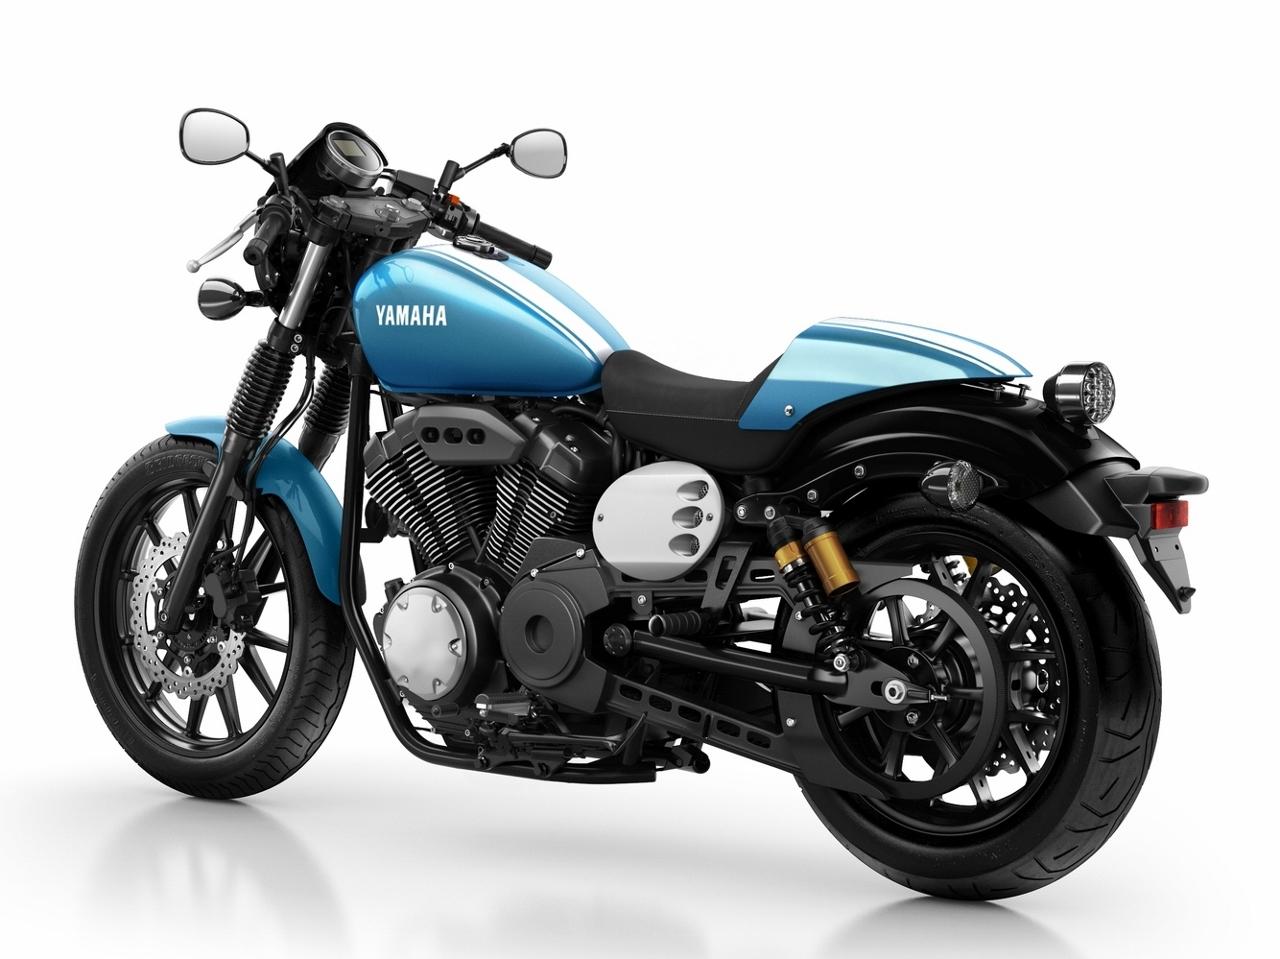 2015-Yamaha-XV950CR-EU-Glacier-Blue-Studio-005 (1280x959)